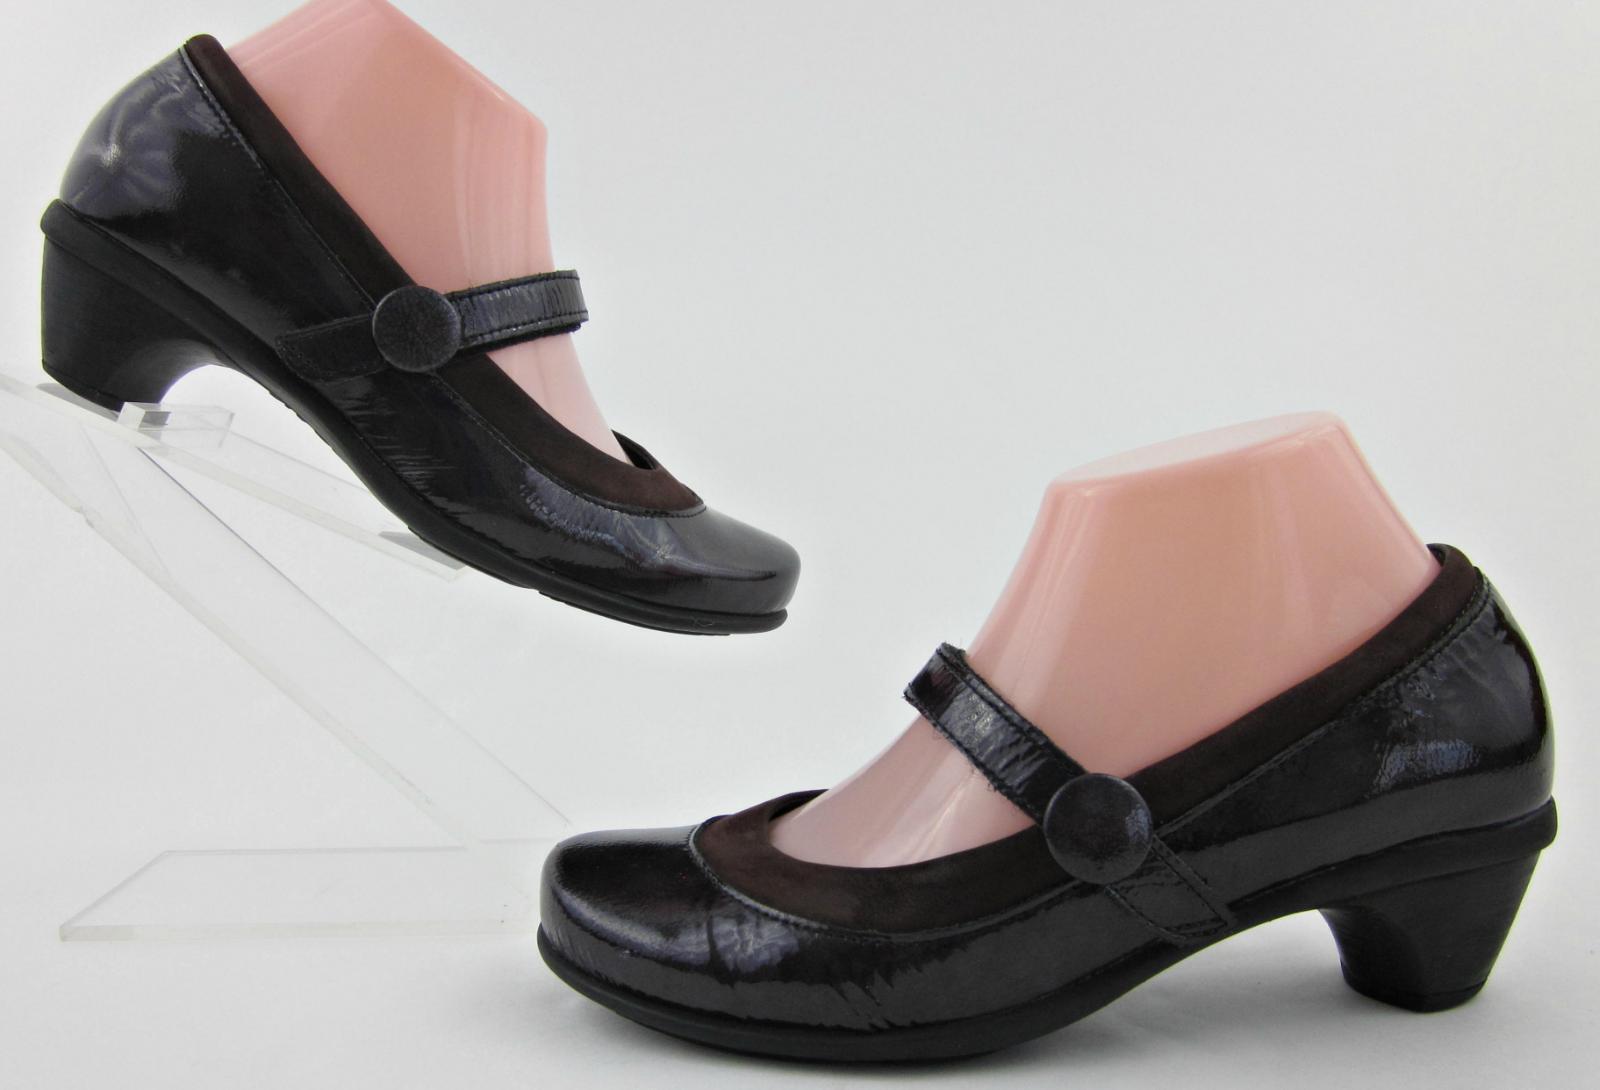 NAOT 'Trendy' Mary Jane Heels Peacock Patent Leather EU 37   US 6 Fantastic